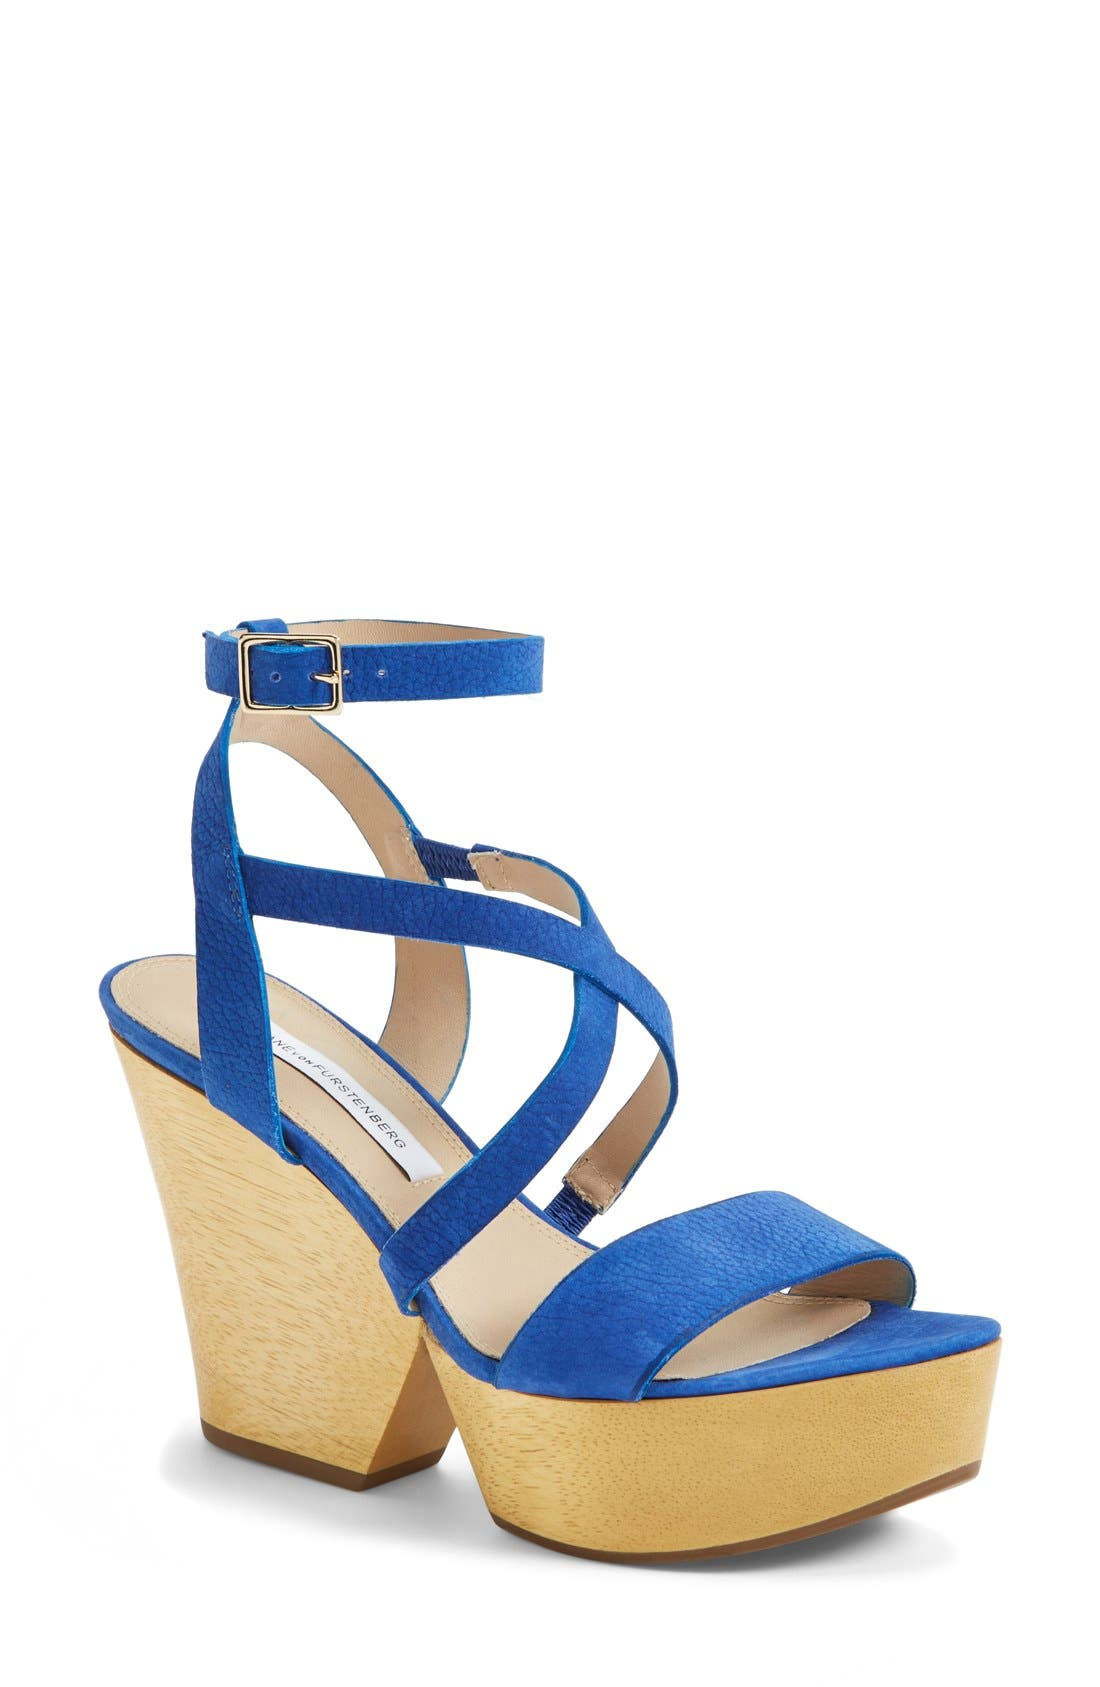 'Lamille' Leather Platform Wedge Sandal,                             Main thumbnail 1, color,                             Blue Riviera